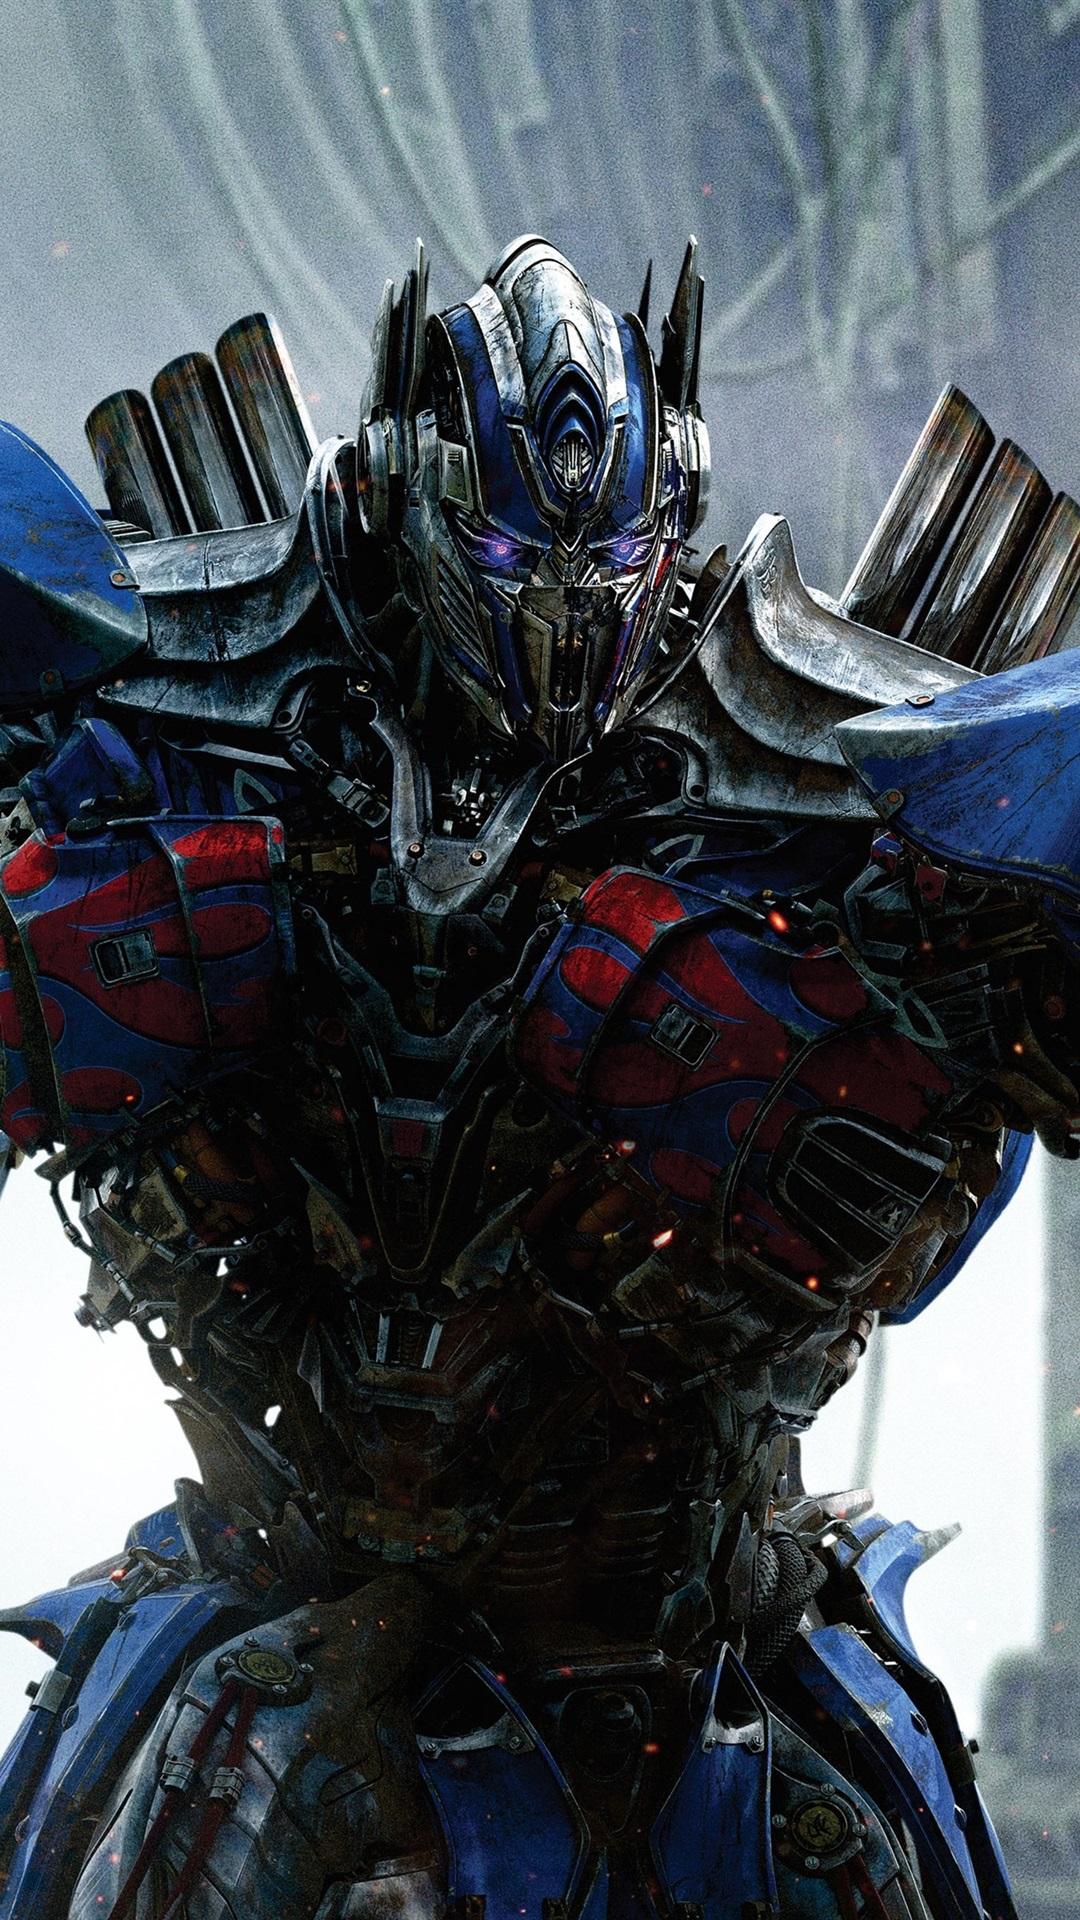 Wallpaper Optimus Prime Transformers The Last Knight 3840x2160